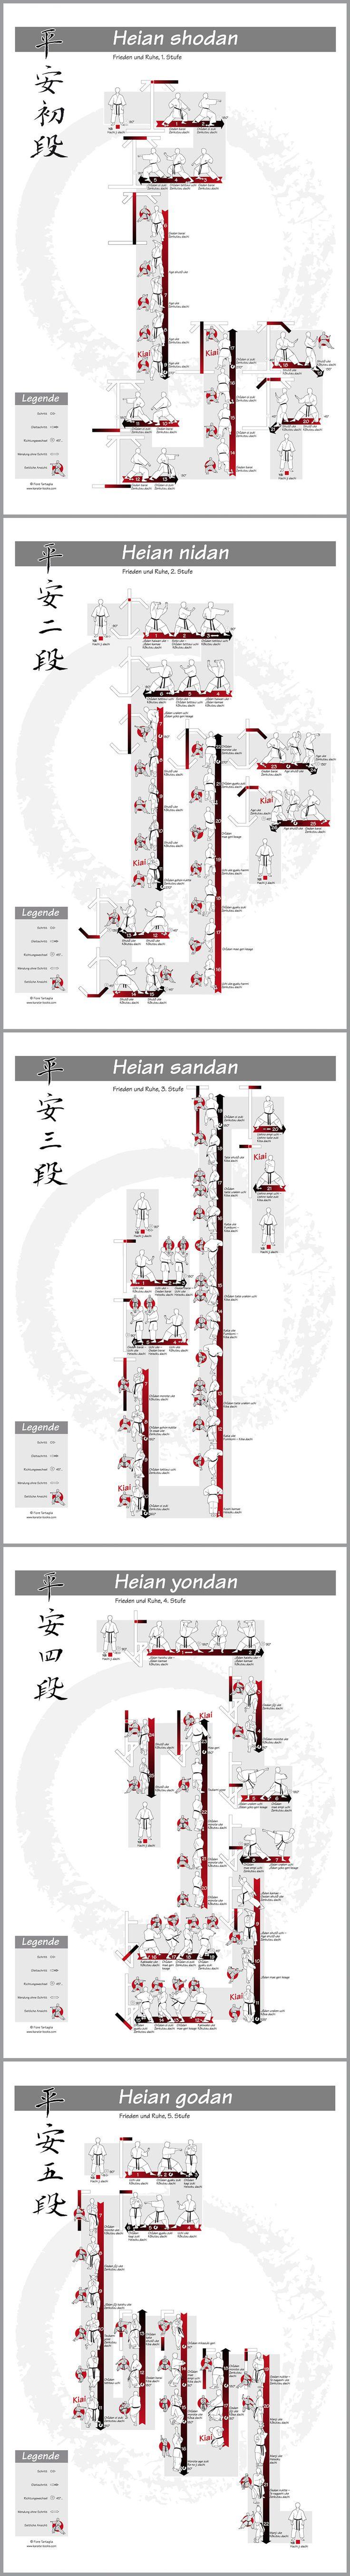 Poster Basis-Kata Shotokan: Heian shodan, Heian nidan, Heian sandan, Heian…                                                                                                                                                                                 More